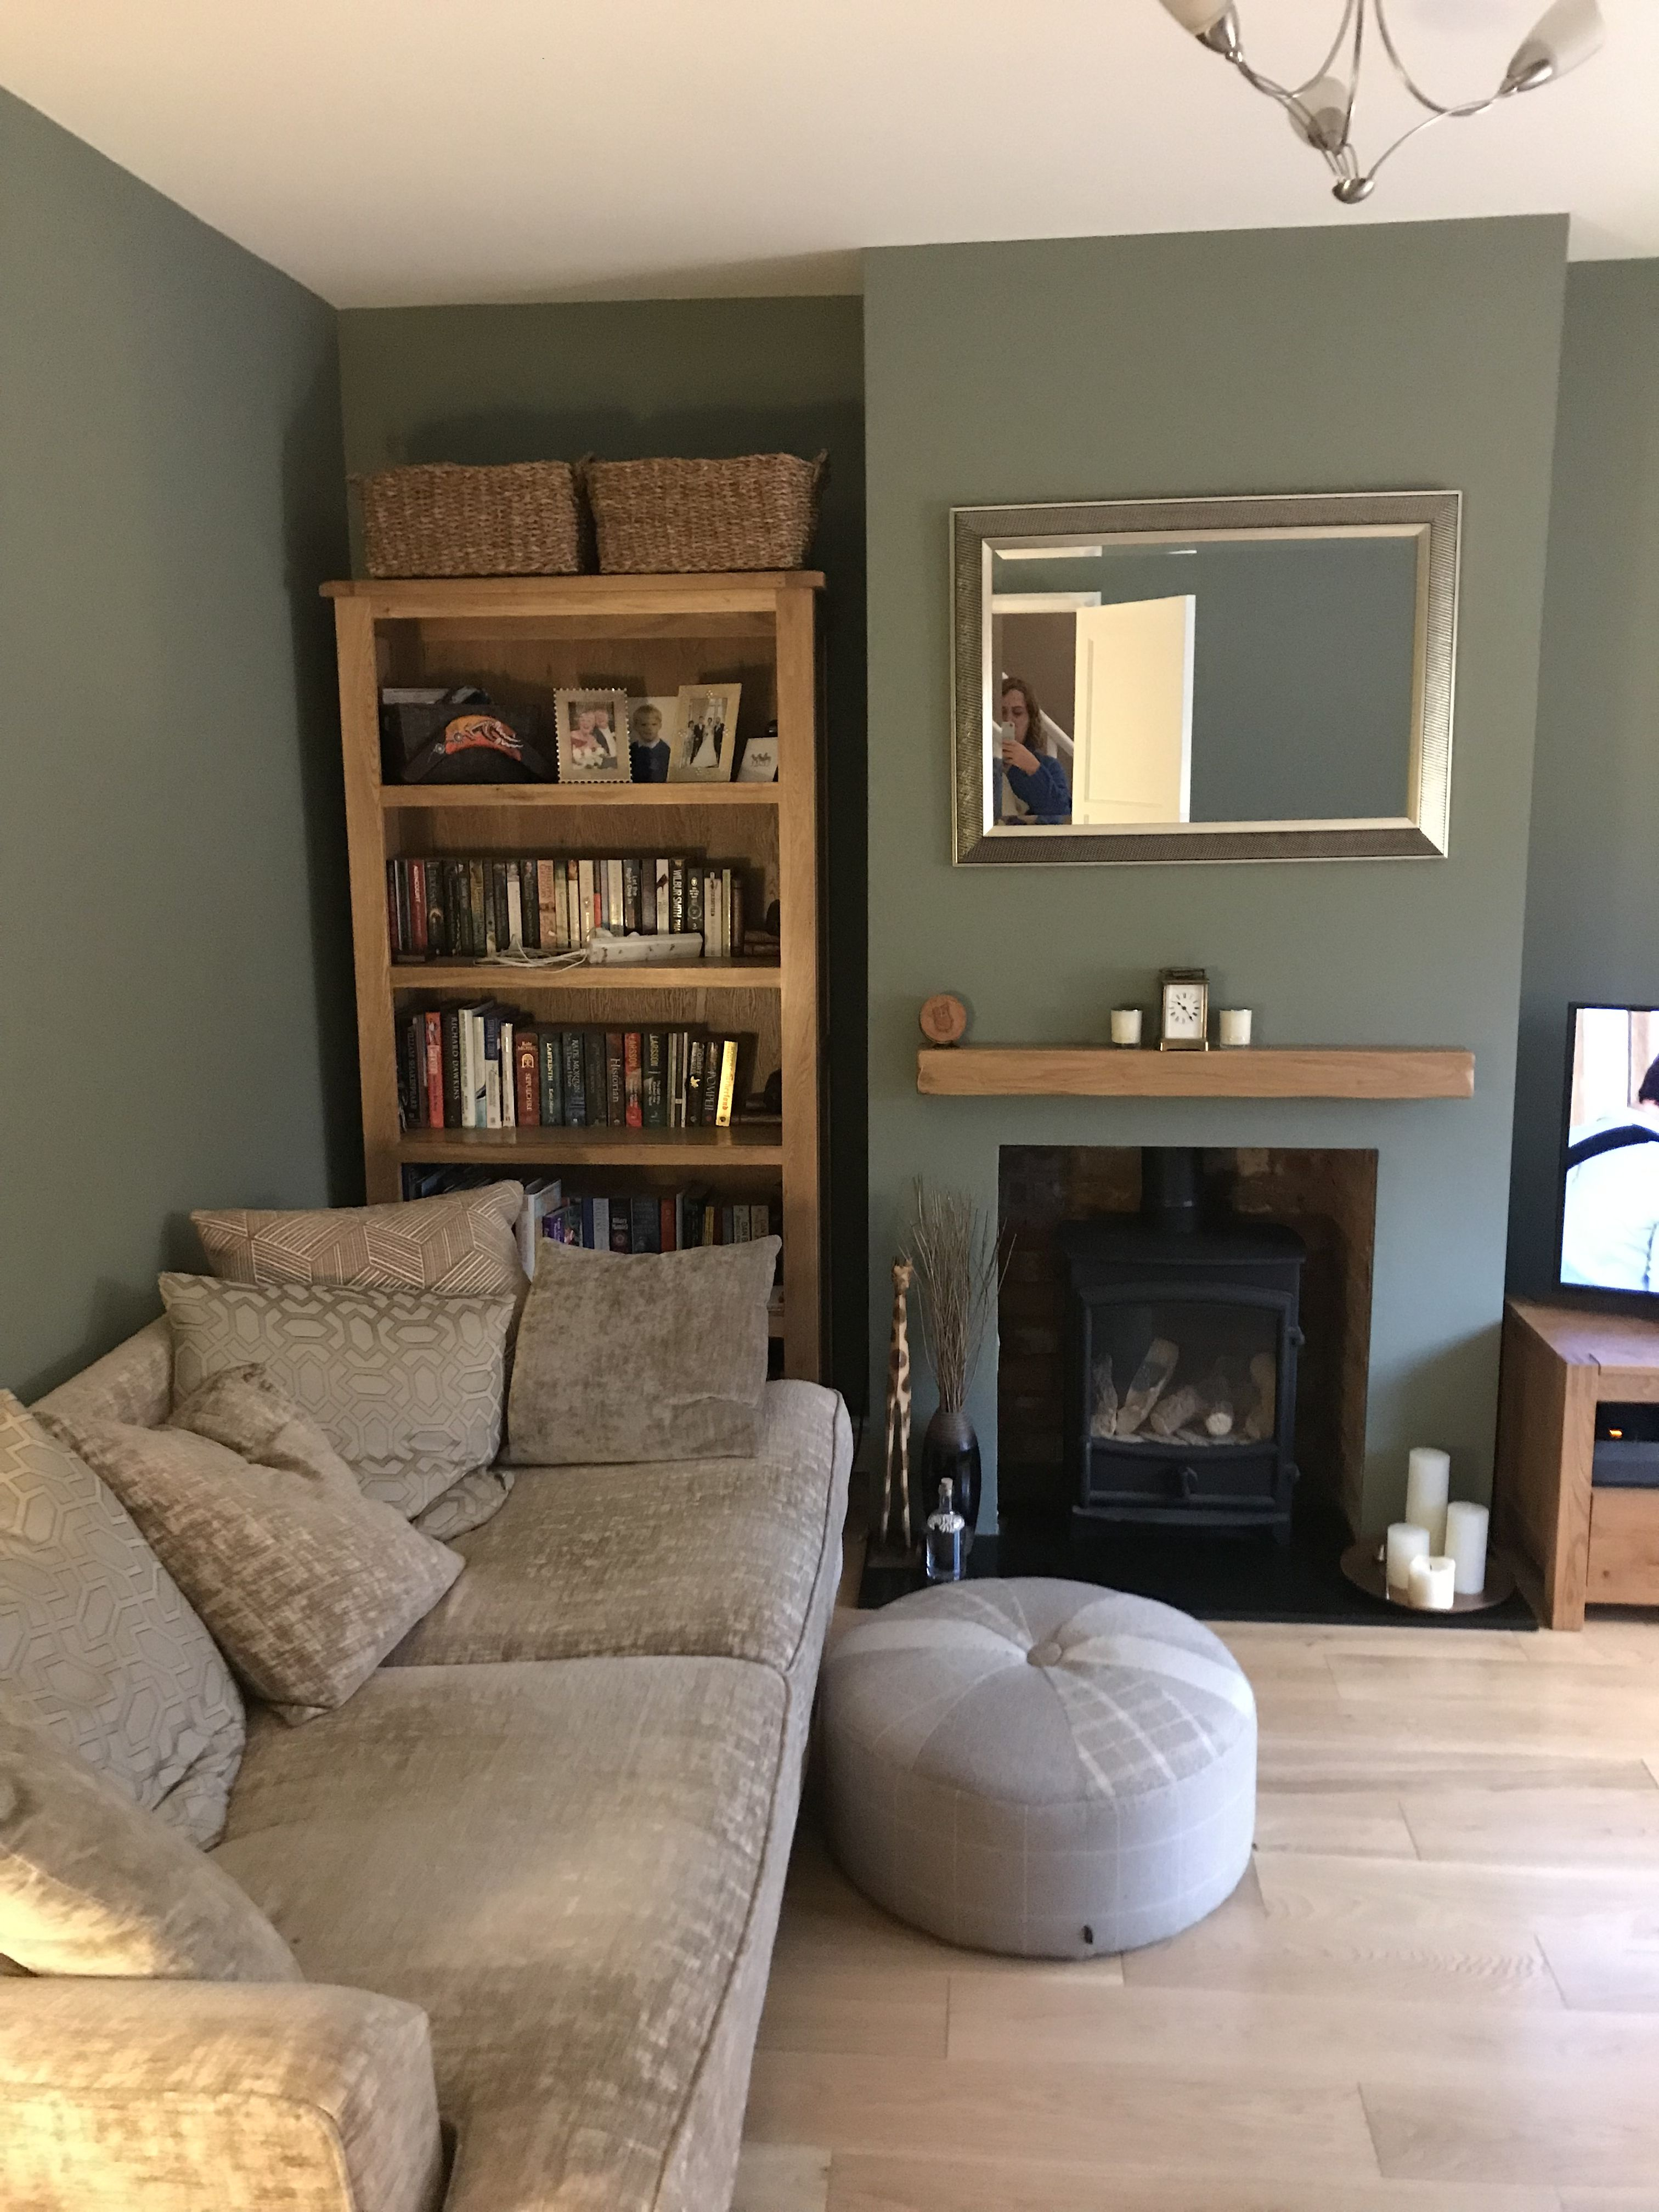 Living Room Rebrand Green Living Room Decor Feature Wall Living Room Sage Green Living Room #sage #walls #living #room